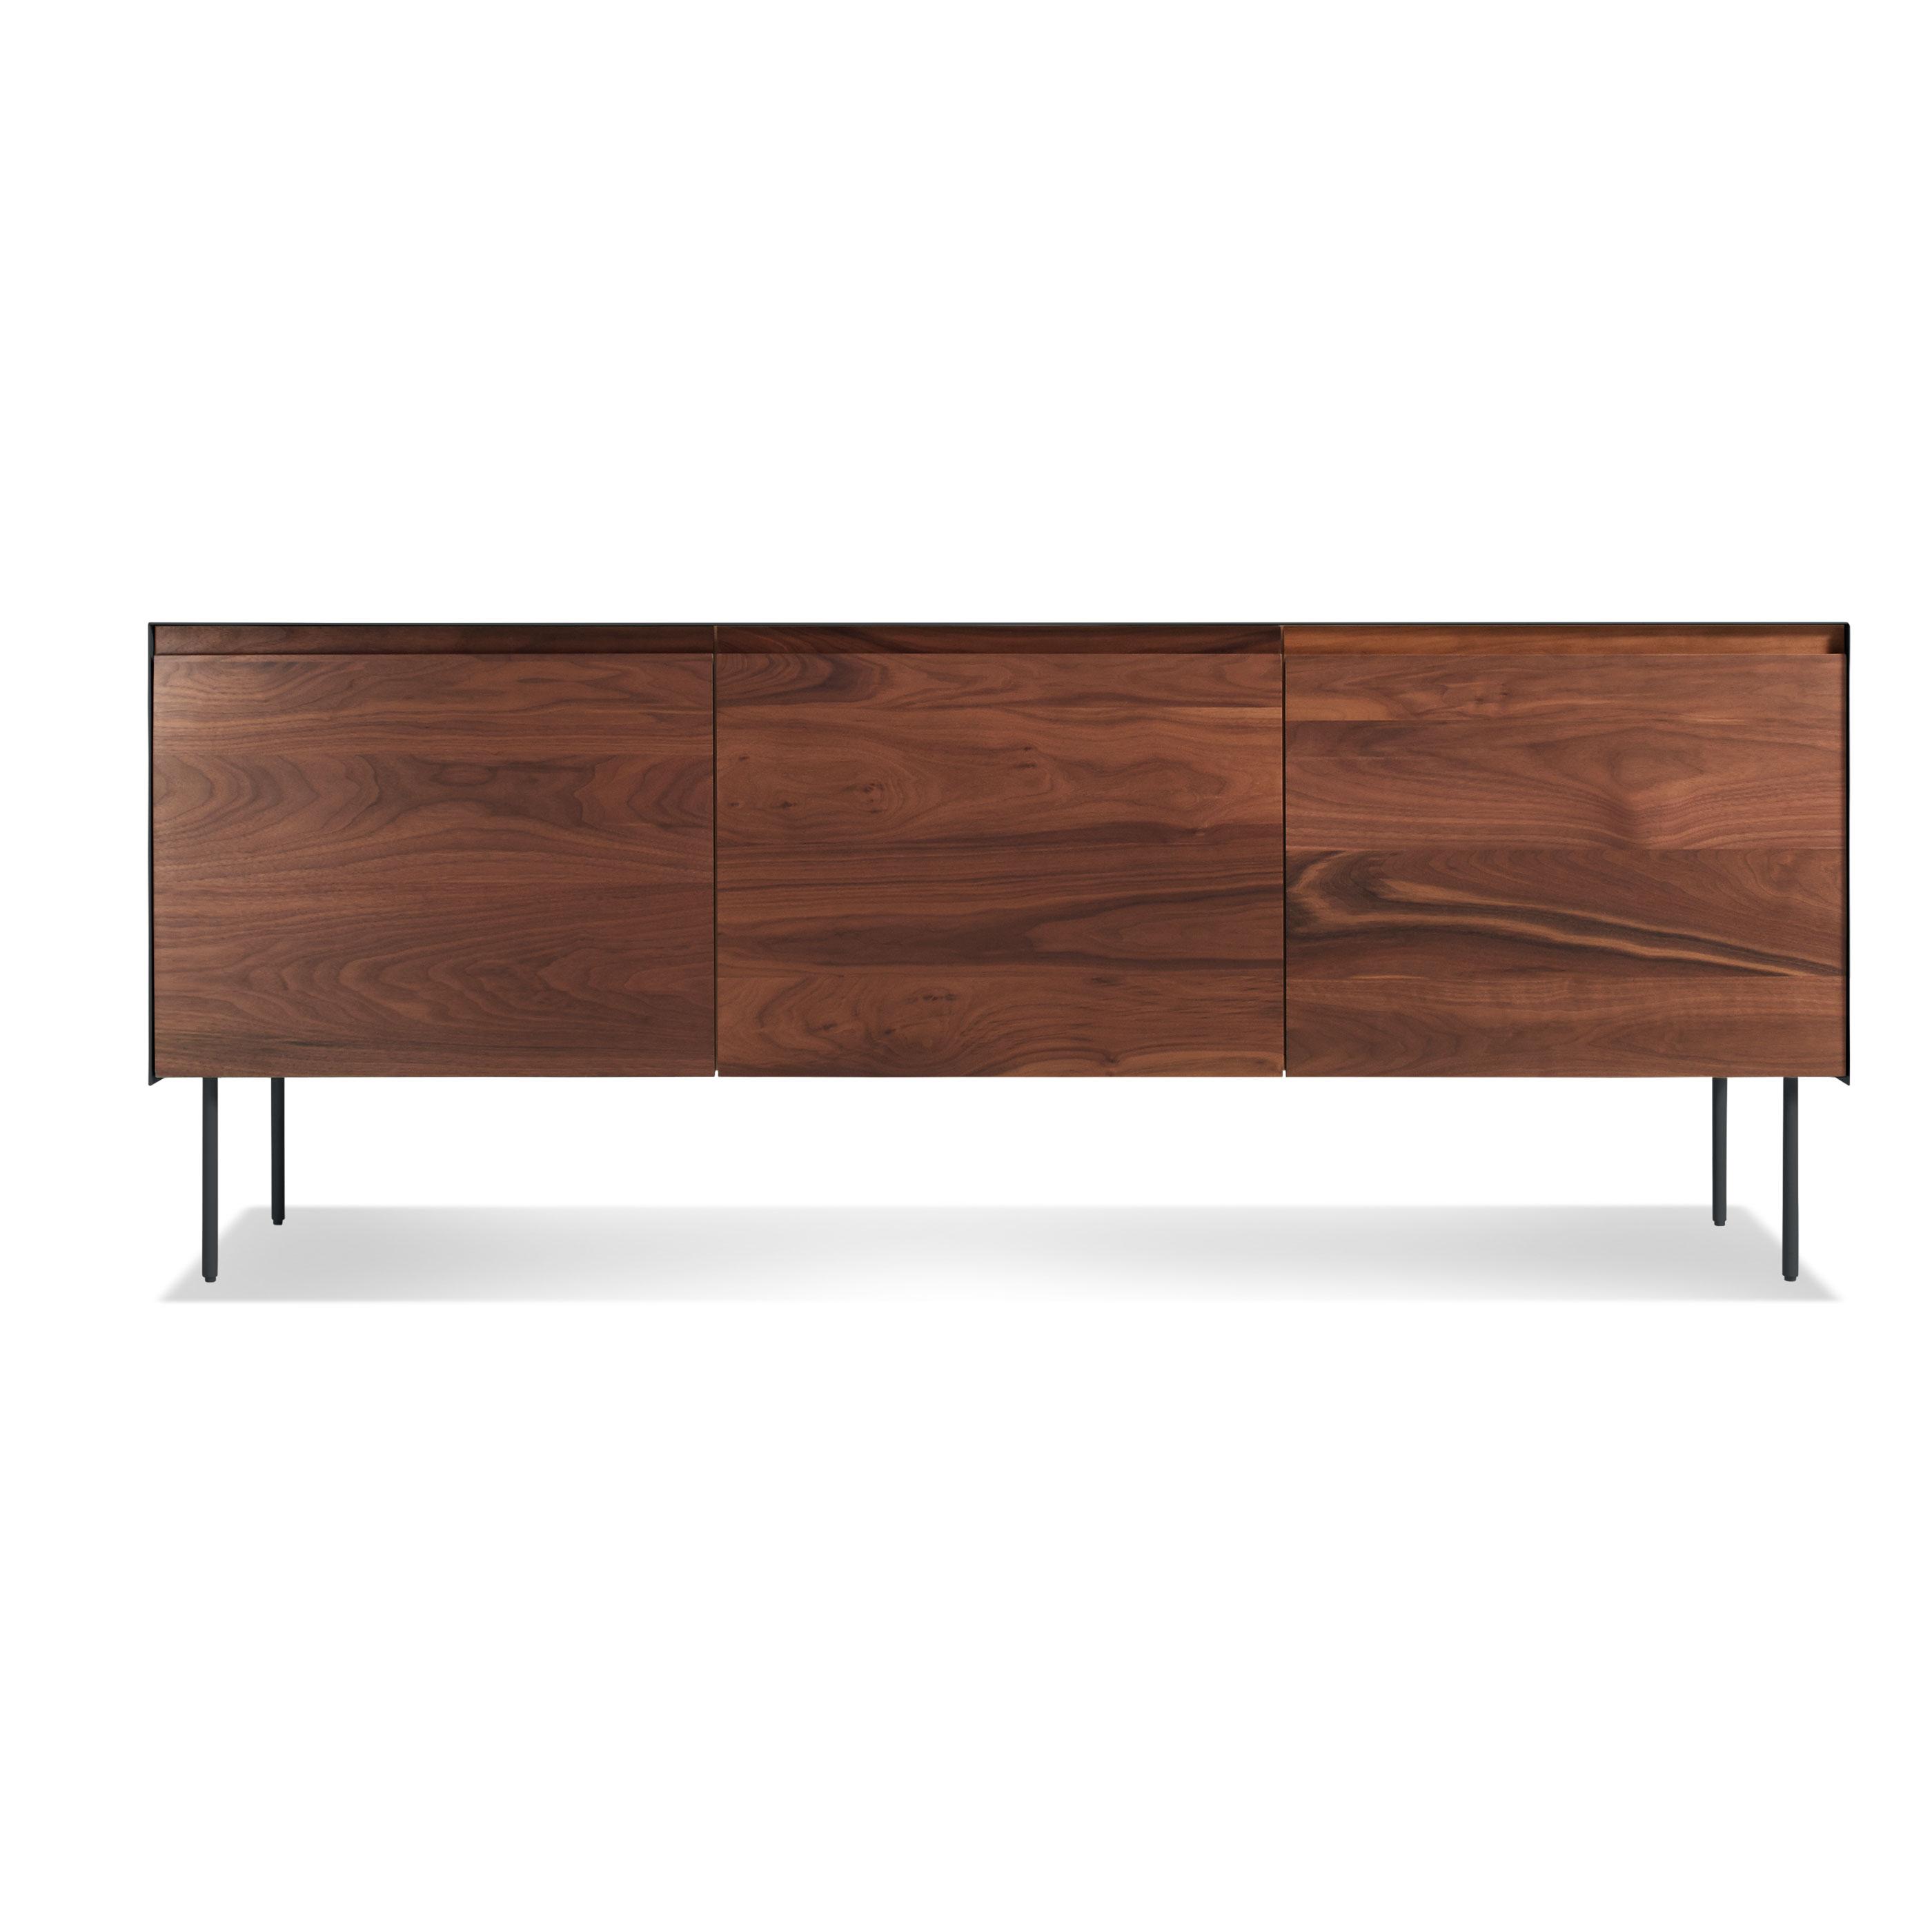 Designer Buffet Tables – Modern Buffet Tables | Matthew Izzo Regarding Candace Door Credenzas (Gallery 22 of 30)